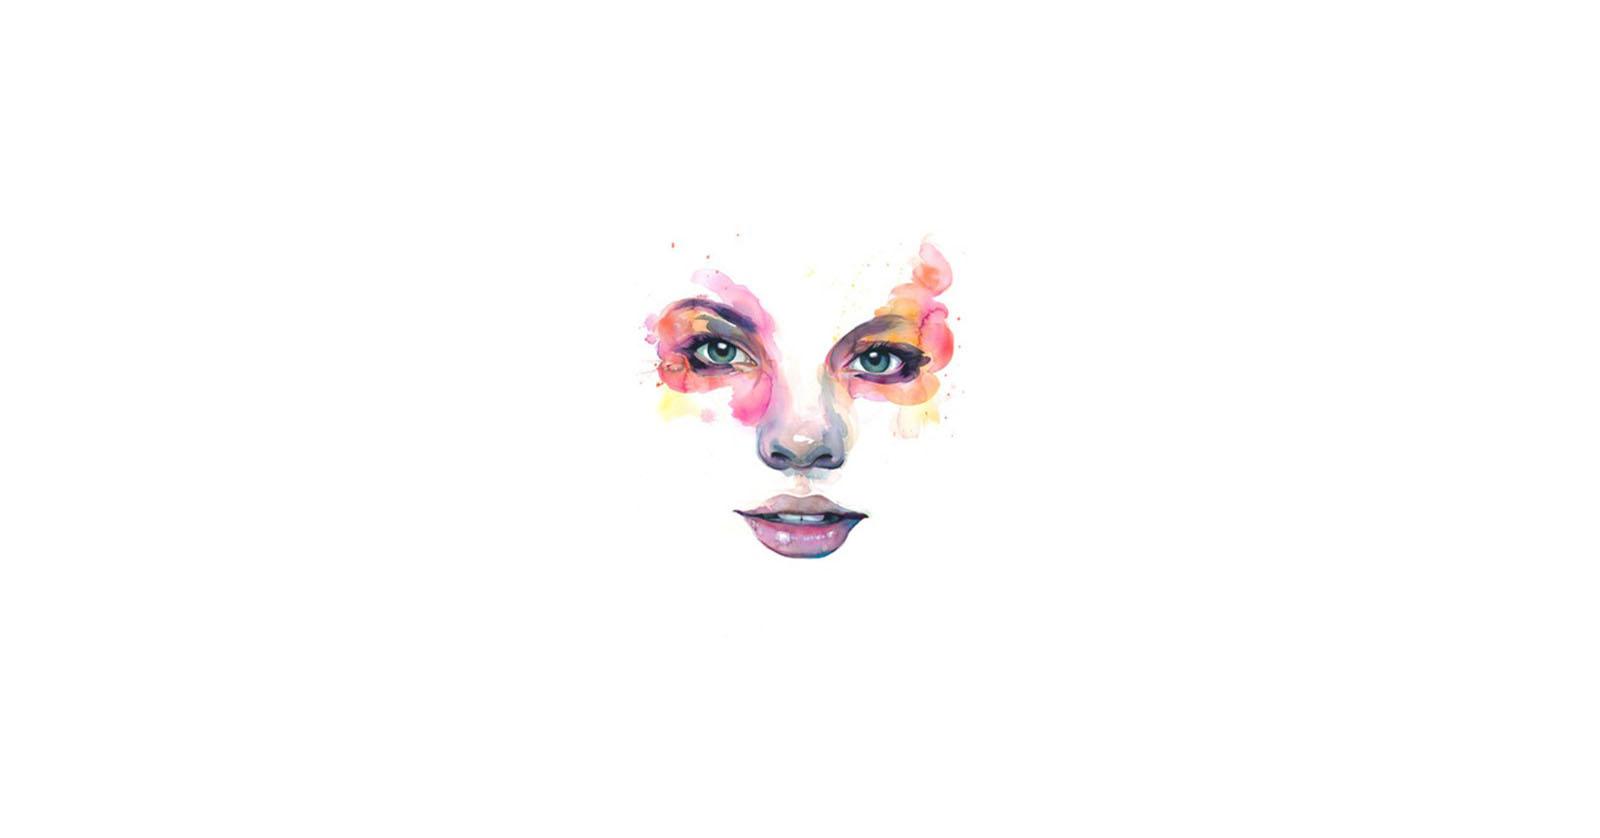 Wallpaper Illustration Graphic Design Roar Movie: Wallpaper : Face, Graphic Design, Nose, Head, Sketch Up